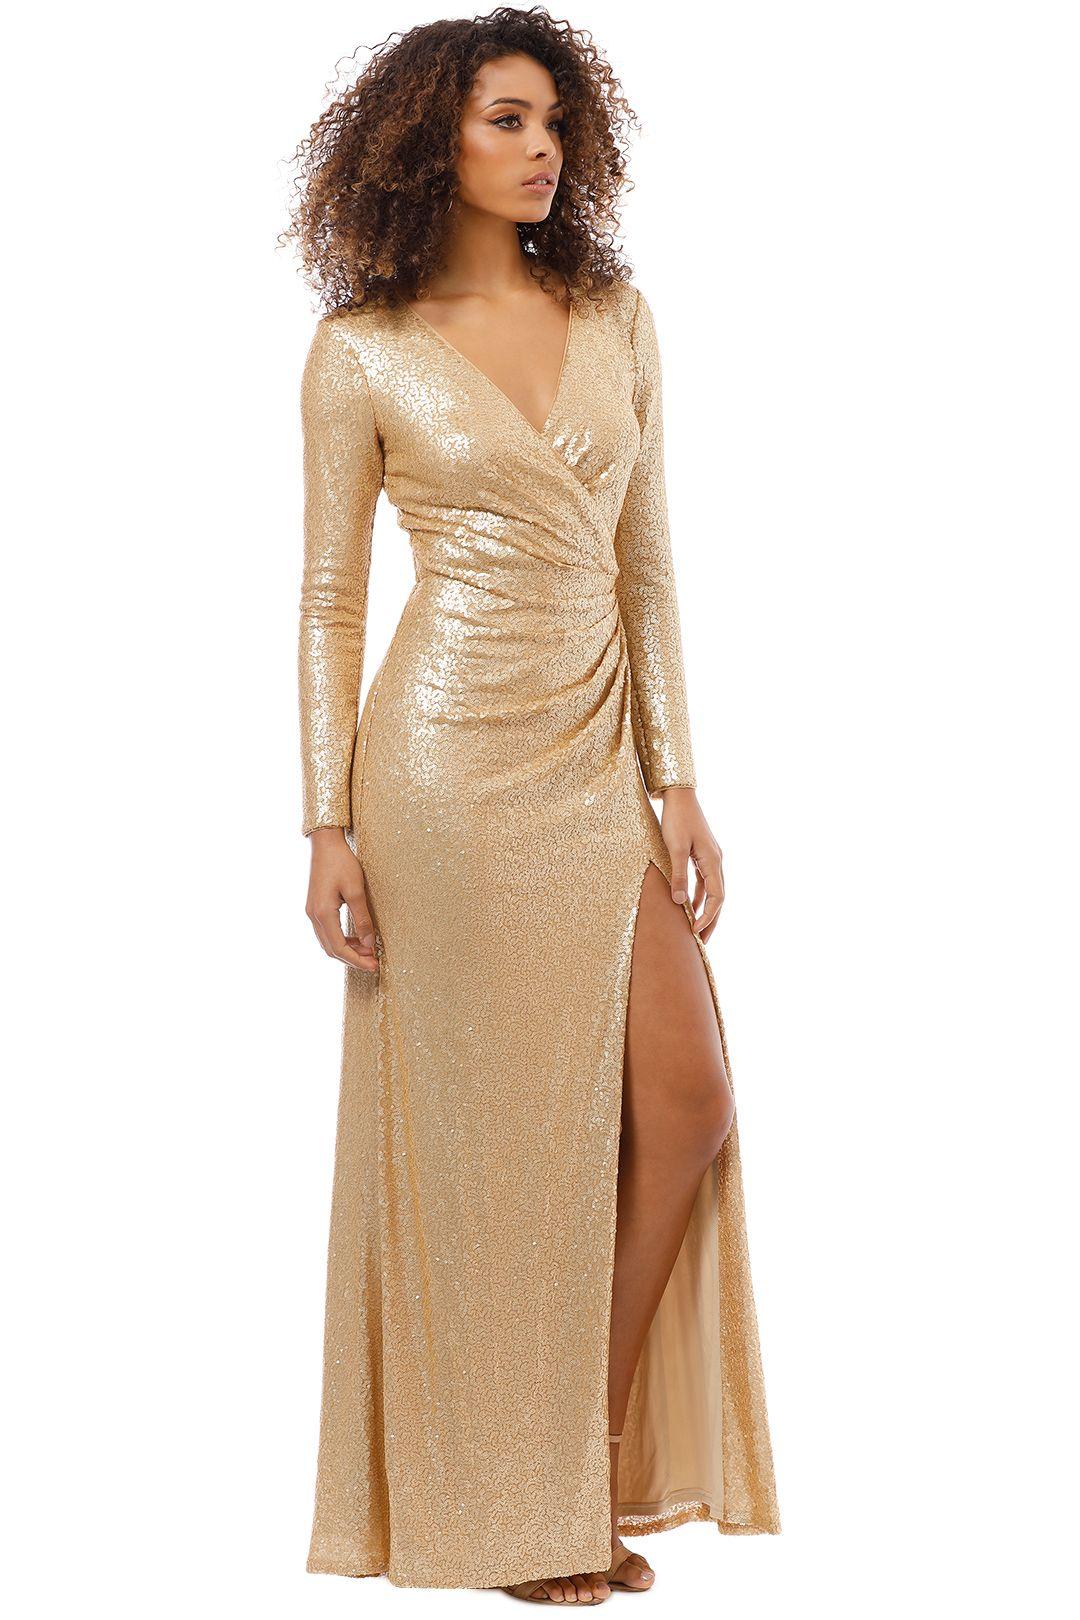 Tadashi Shoji - Angelique Gold Drape Gown - Gold - Side